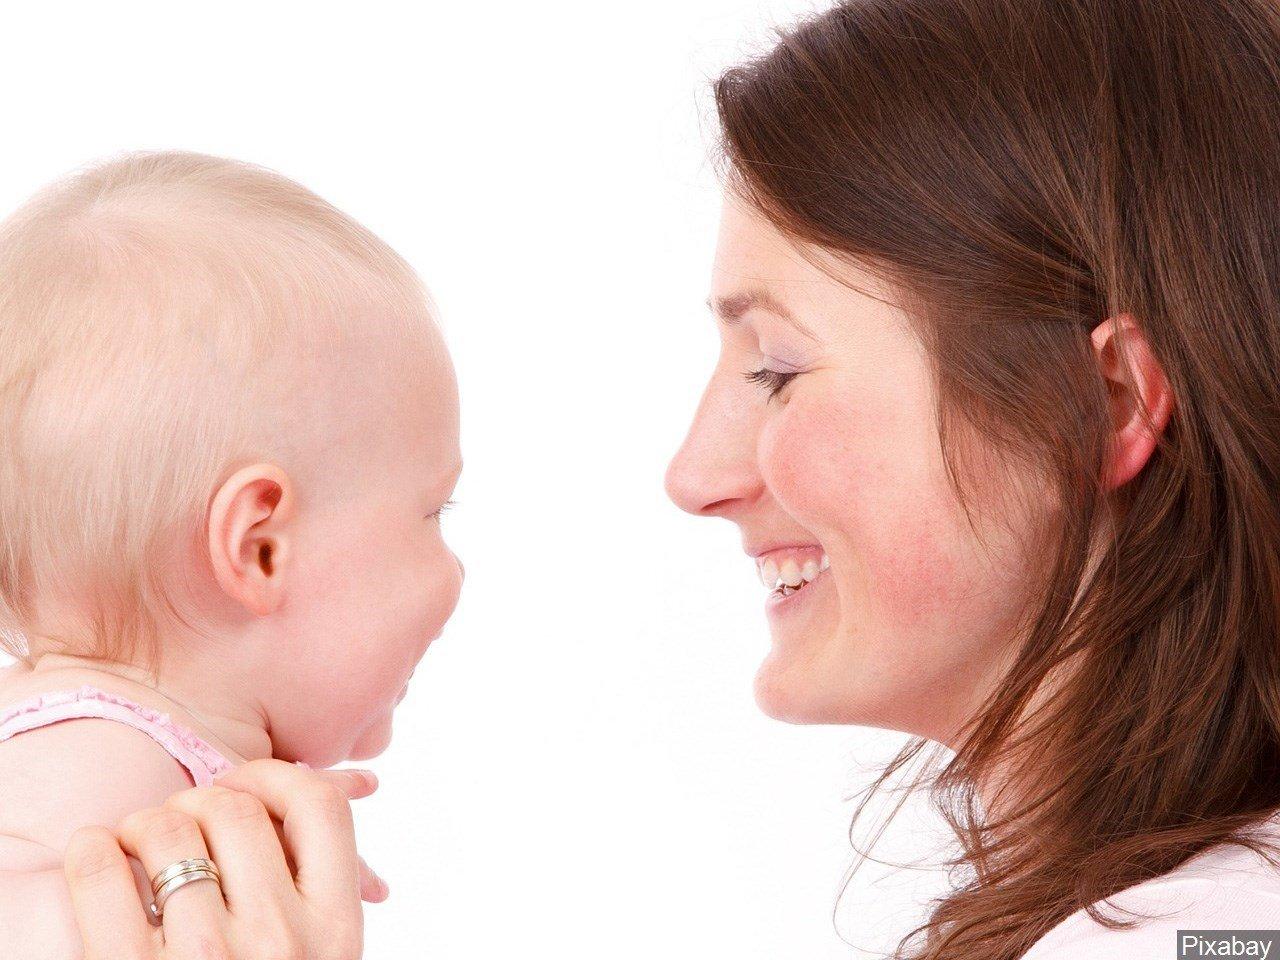 Motherhood is like working 2.5 full-time jobs